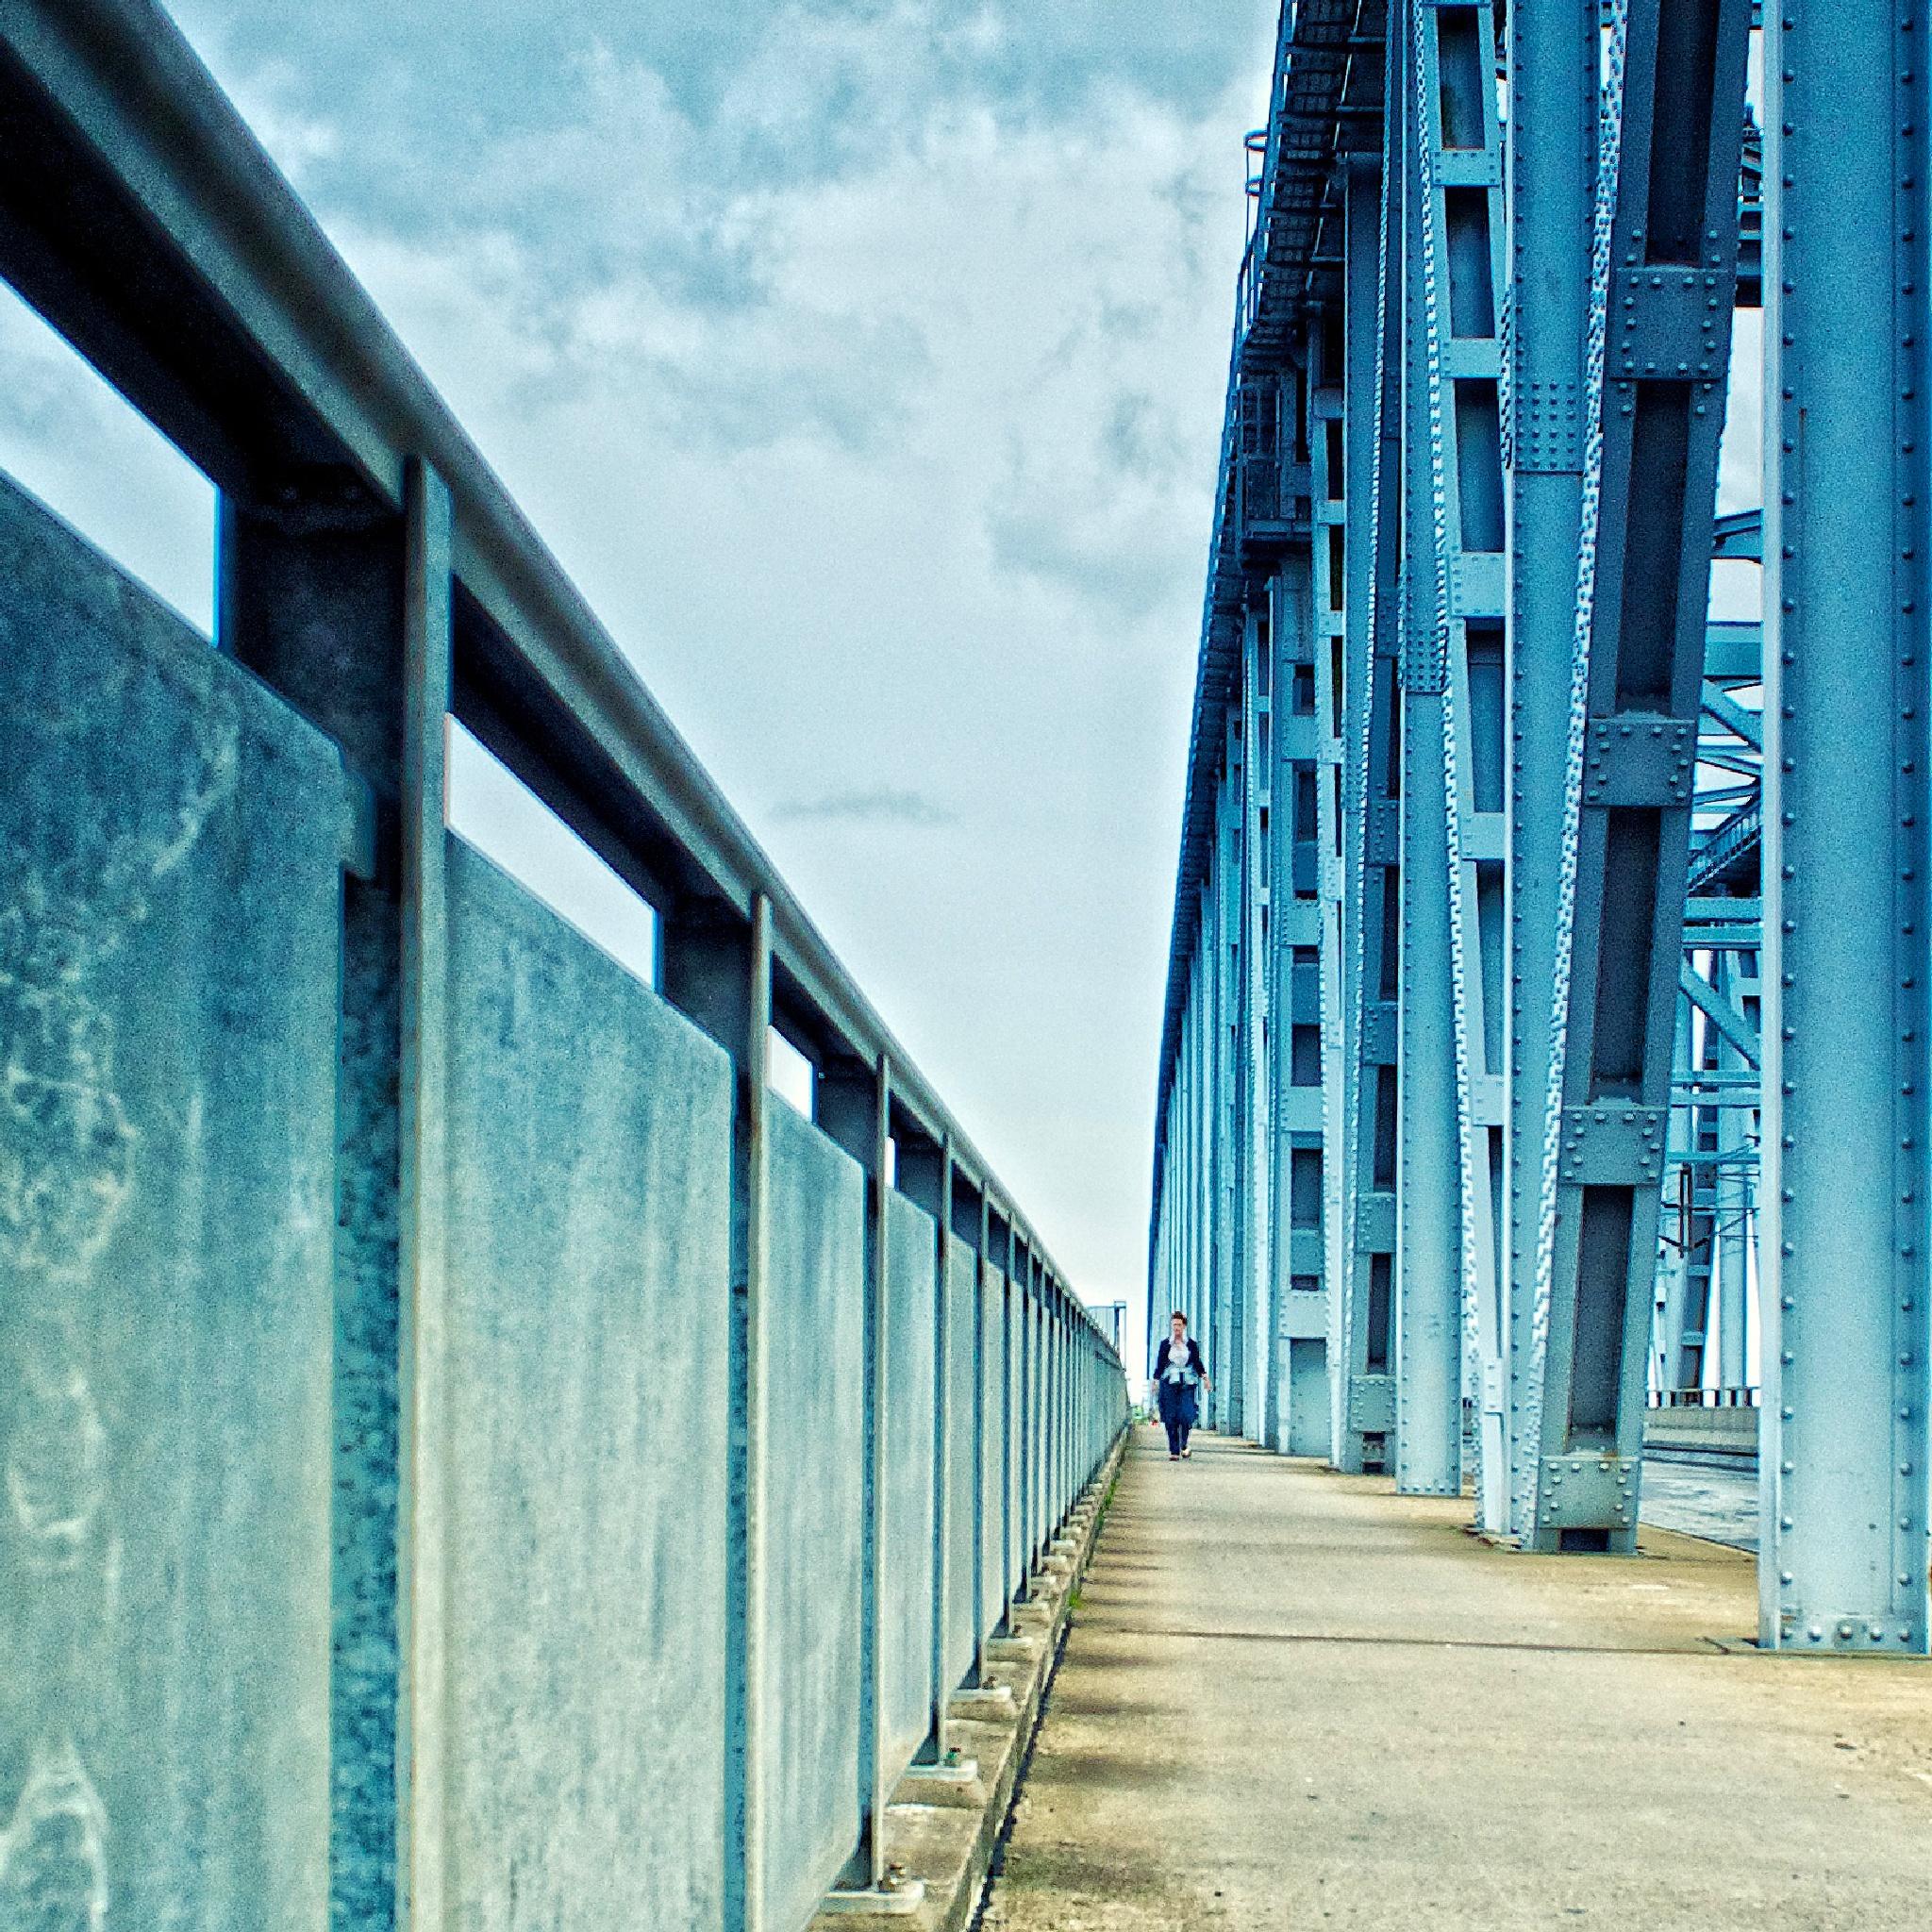 Pedestrian on the old bridge. by Tue Romanow